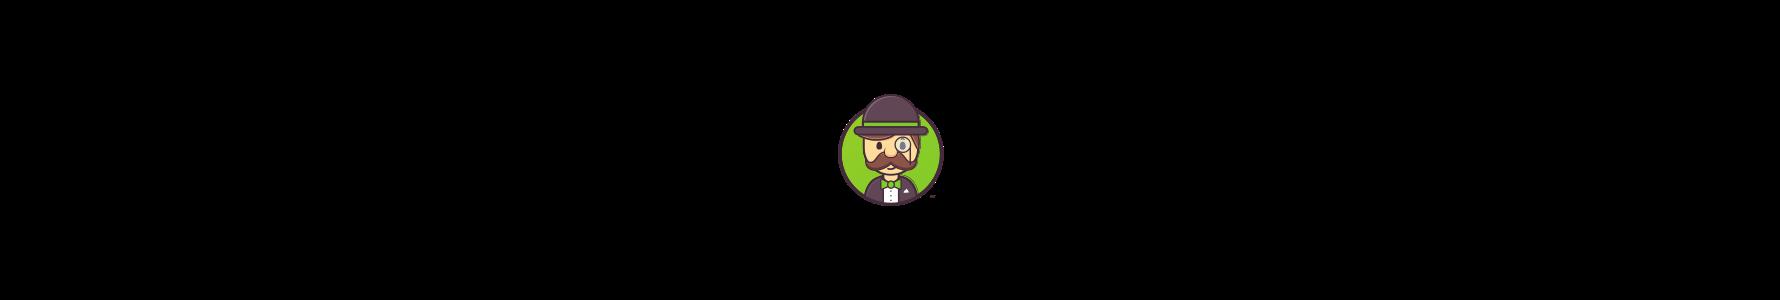 Scaffold a Koa webapp and API framework for Node js - Lad